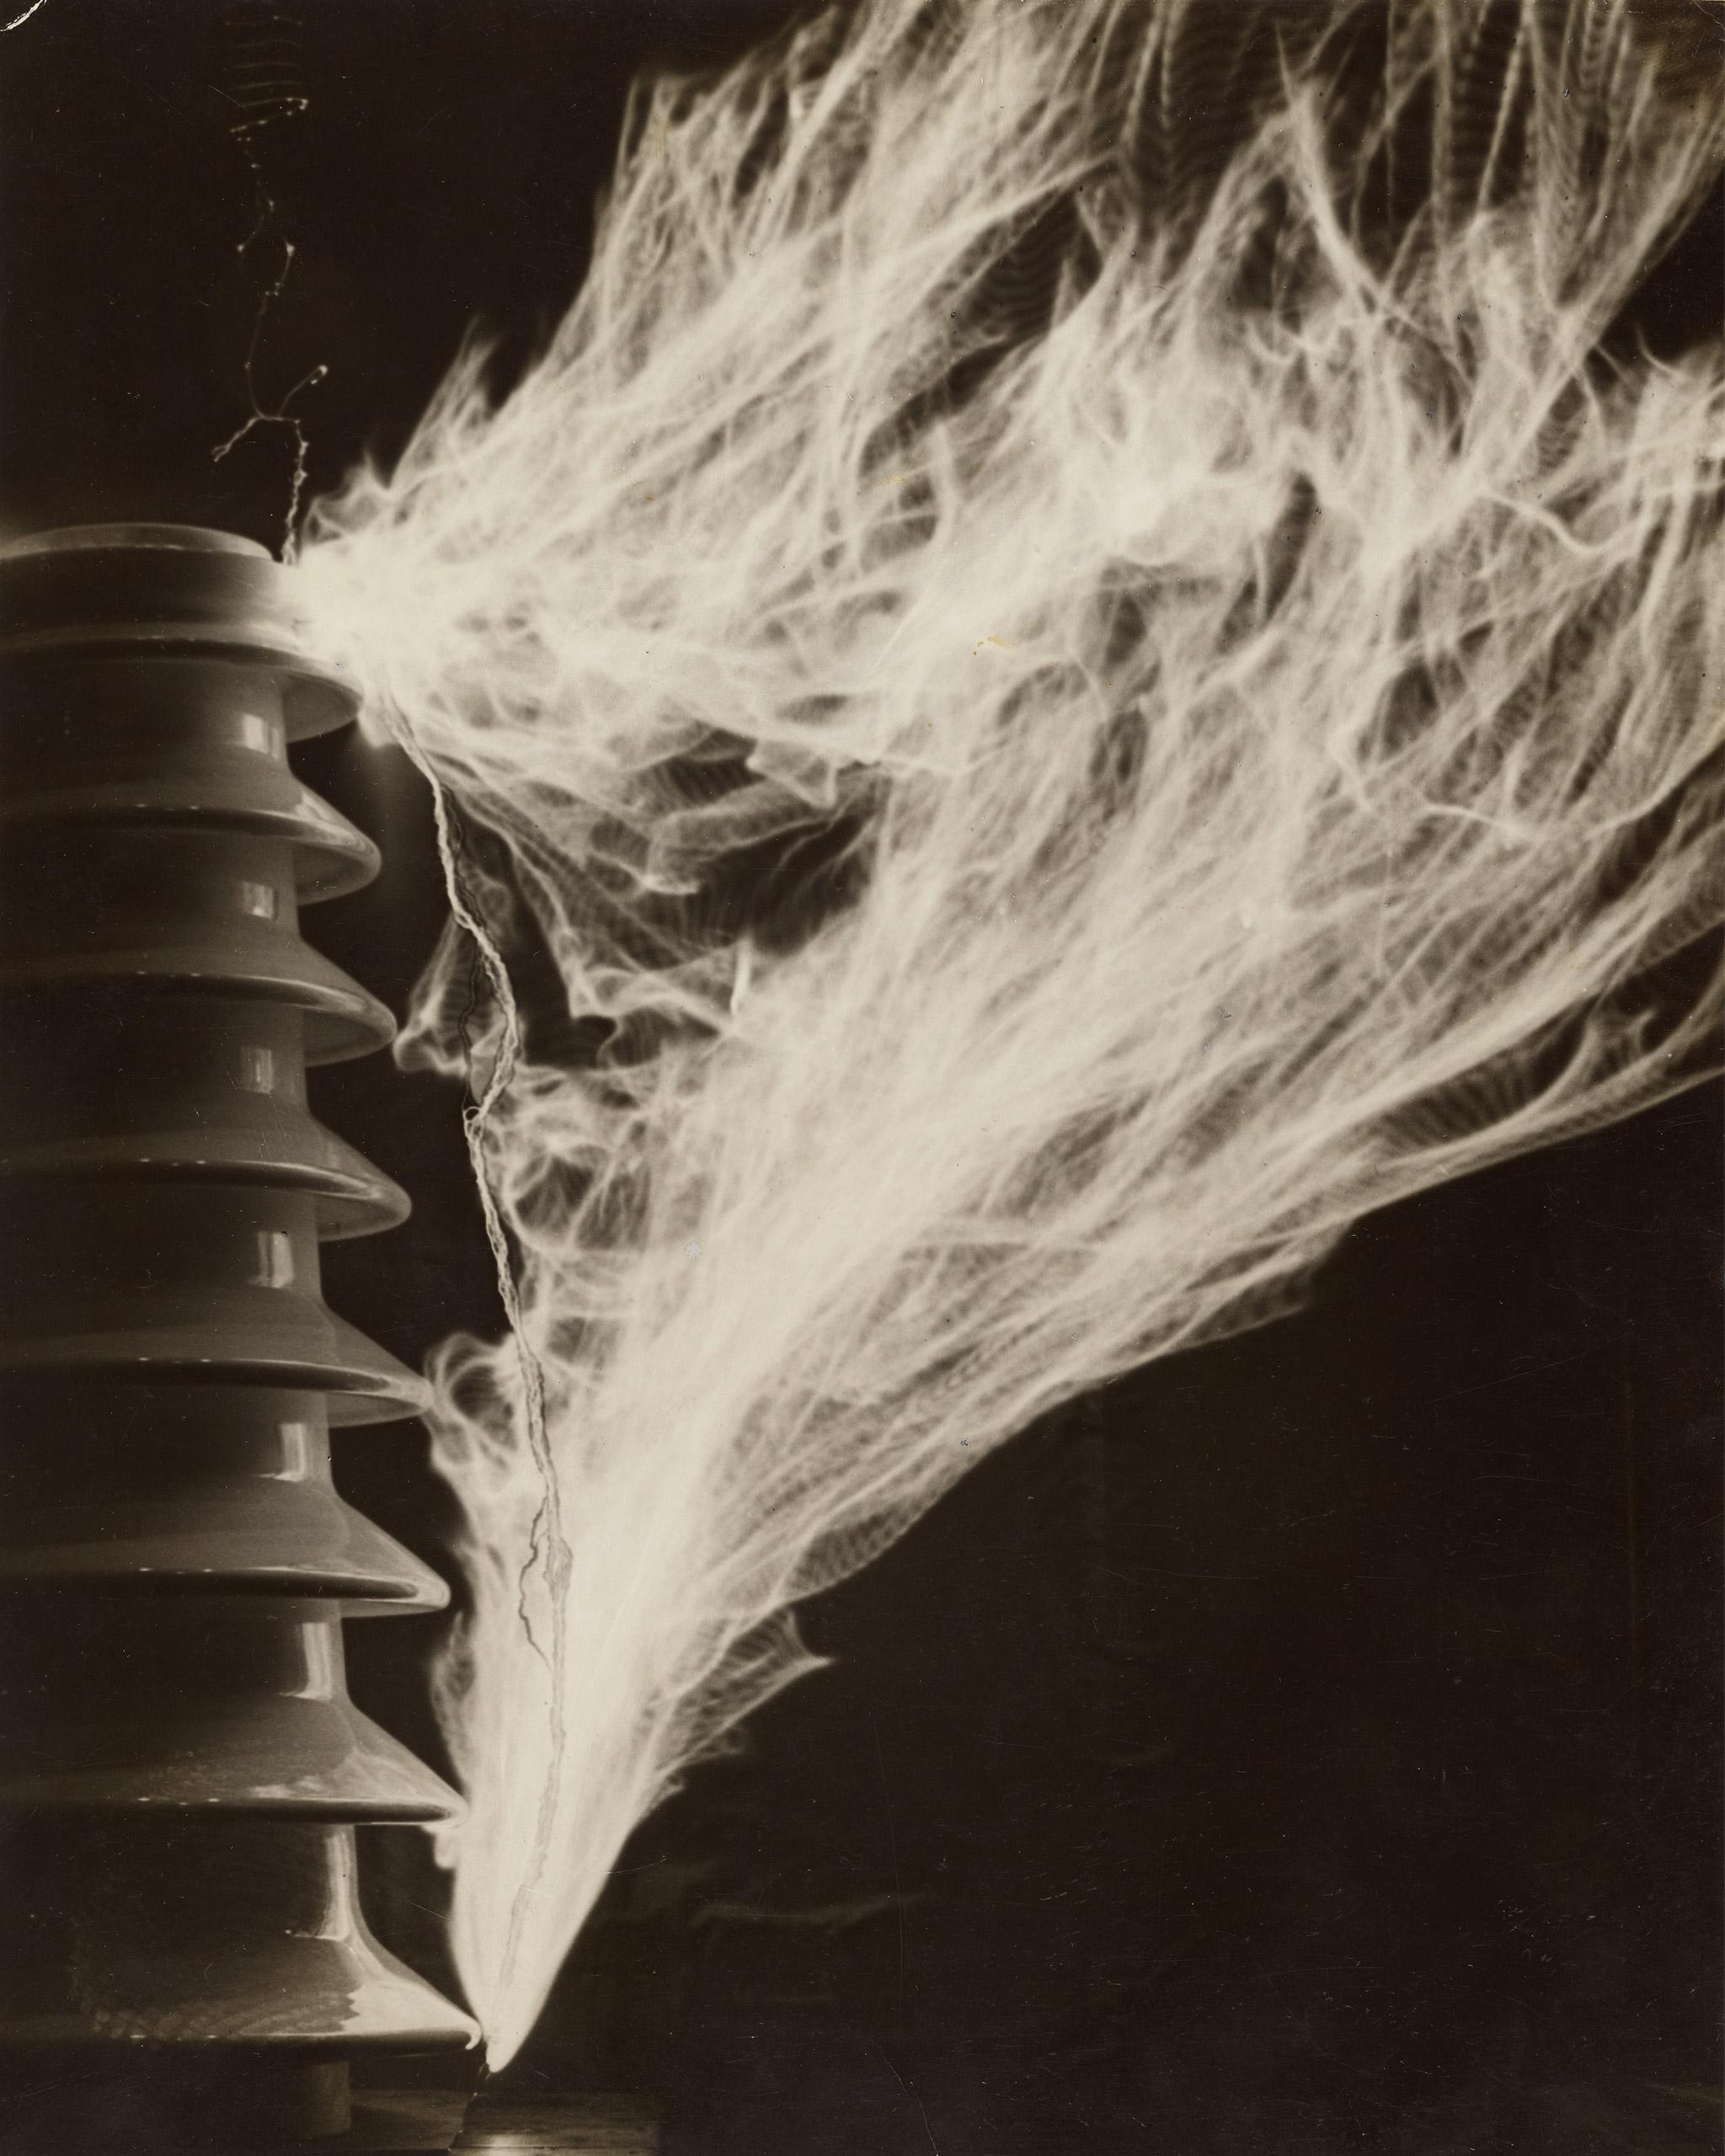 High voltage, 1930© Estate of Martin Munkacsi, Courtesy Howard Greenberg Gallery, NYC / The J. Paul Getty Museum, Los Angeles